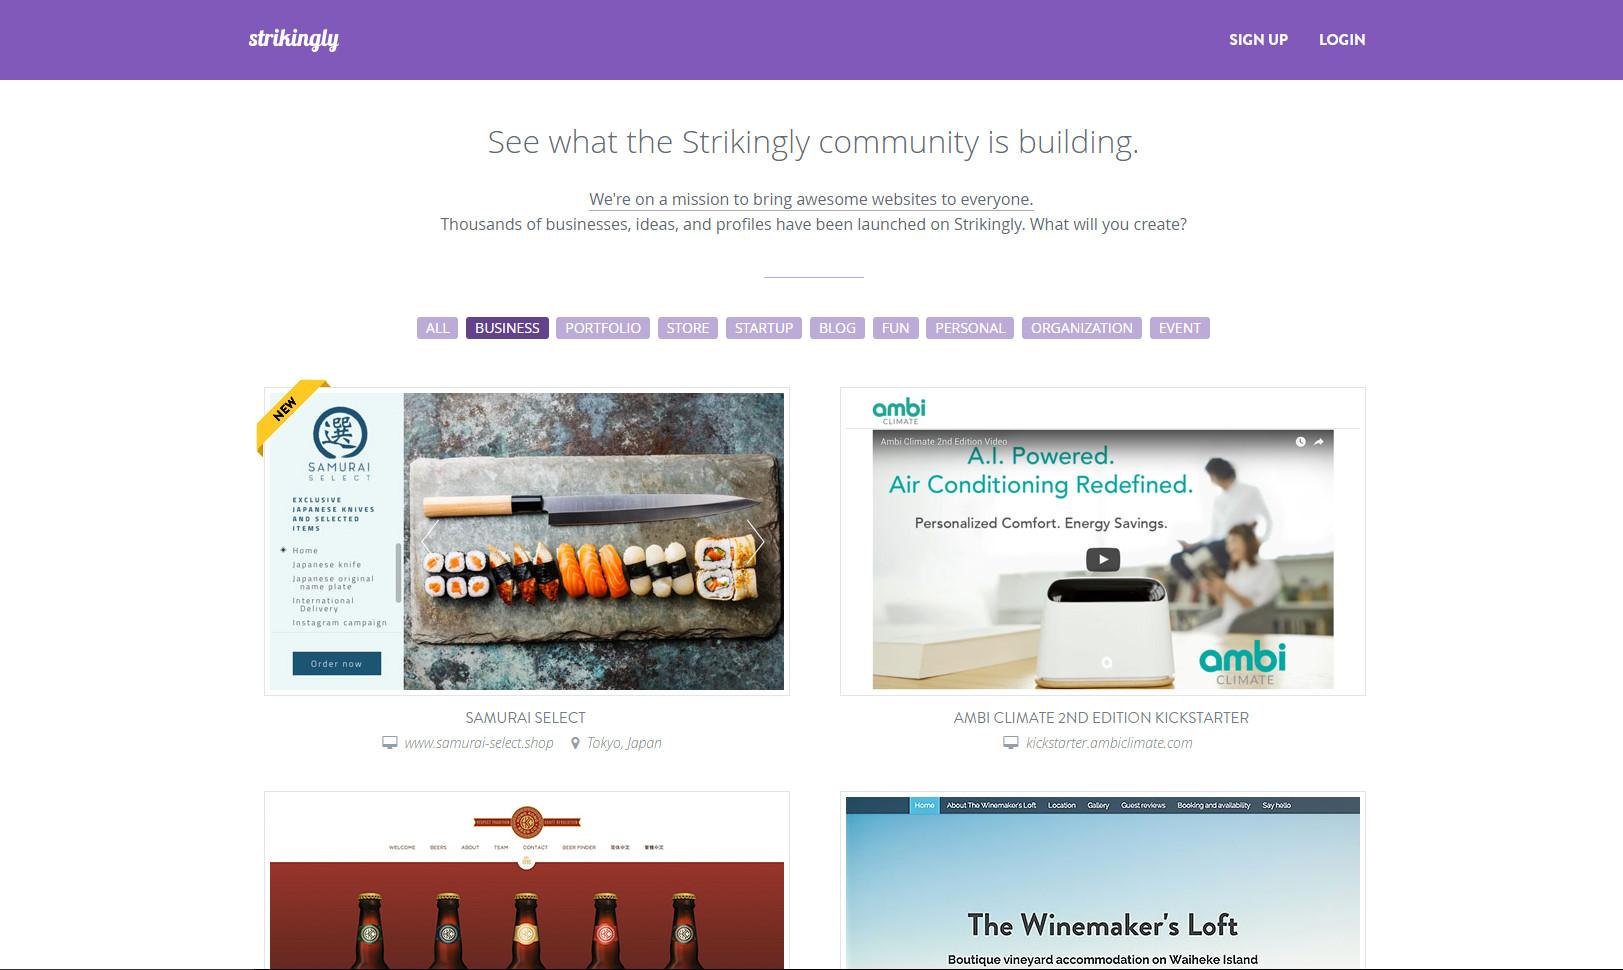 strikingly email hosting, strikingly coupon code, strikingly best website builders